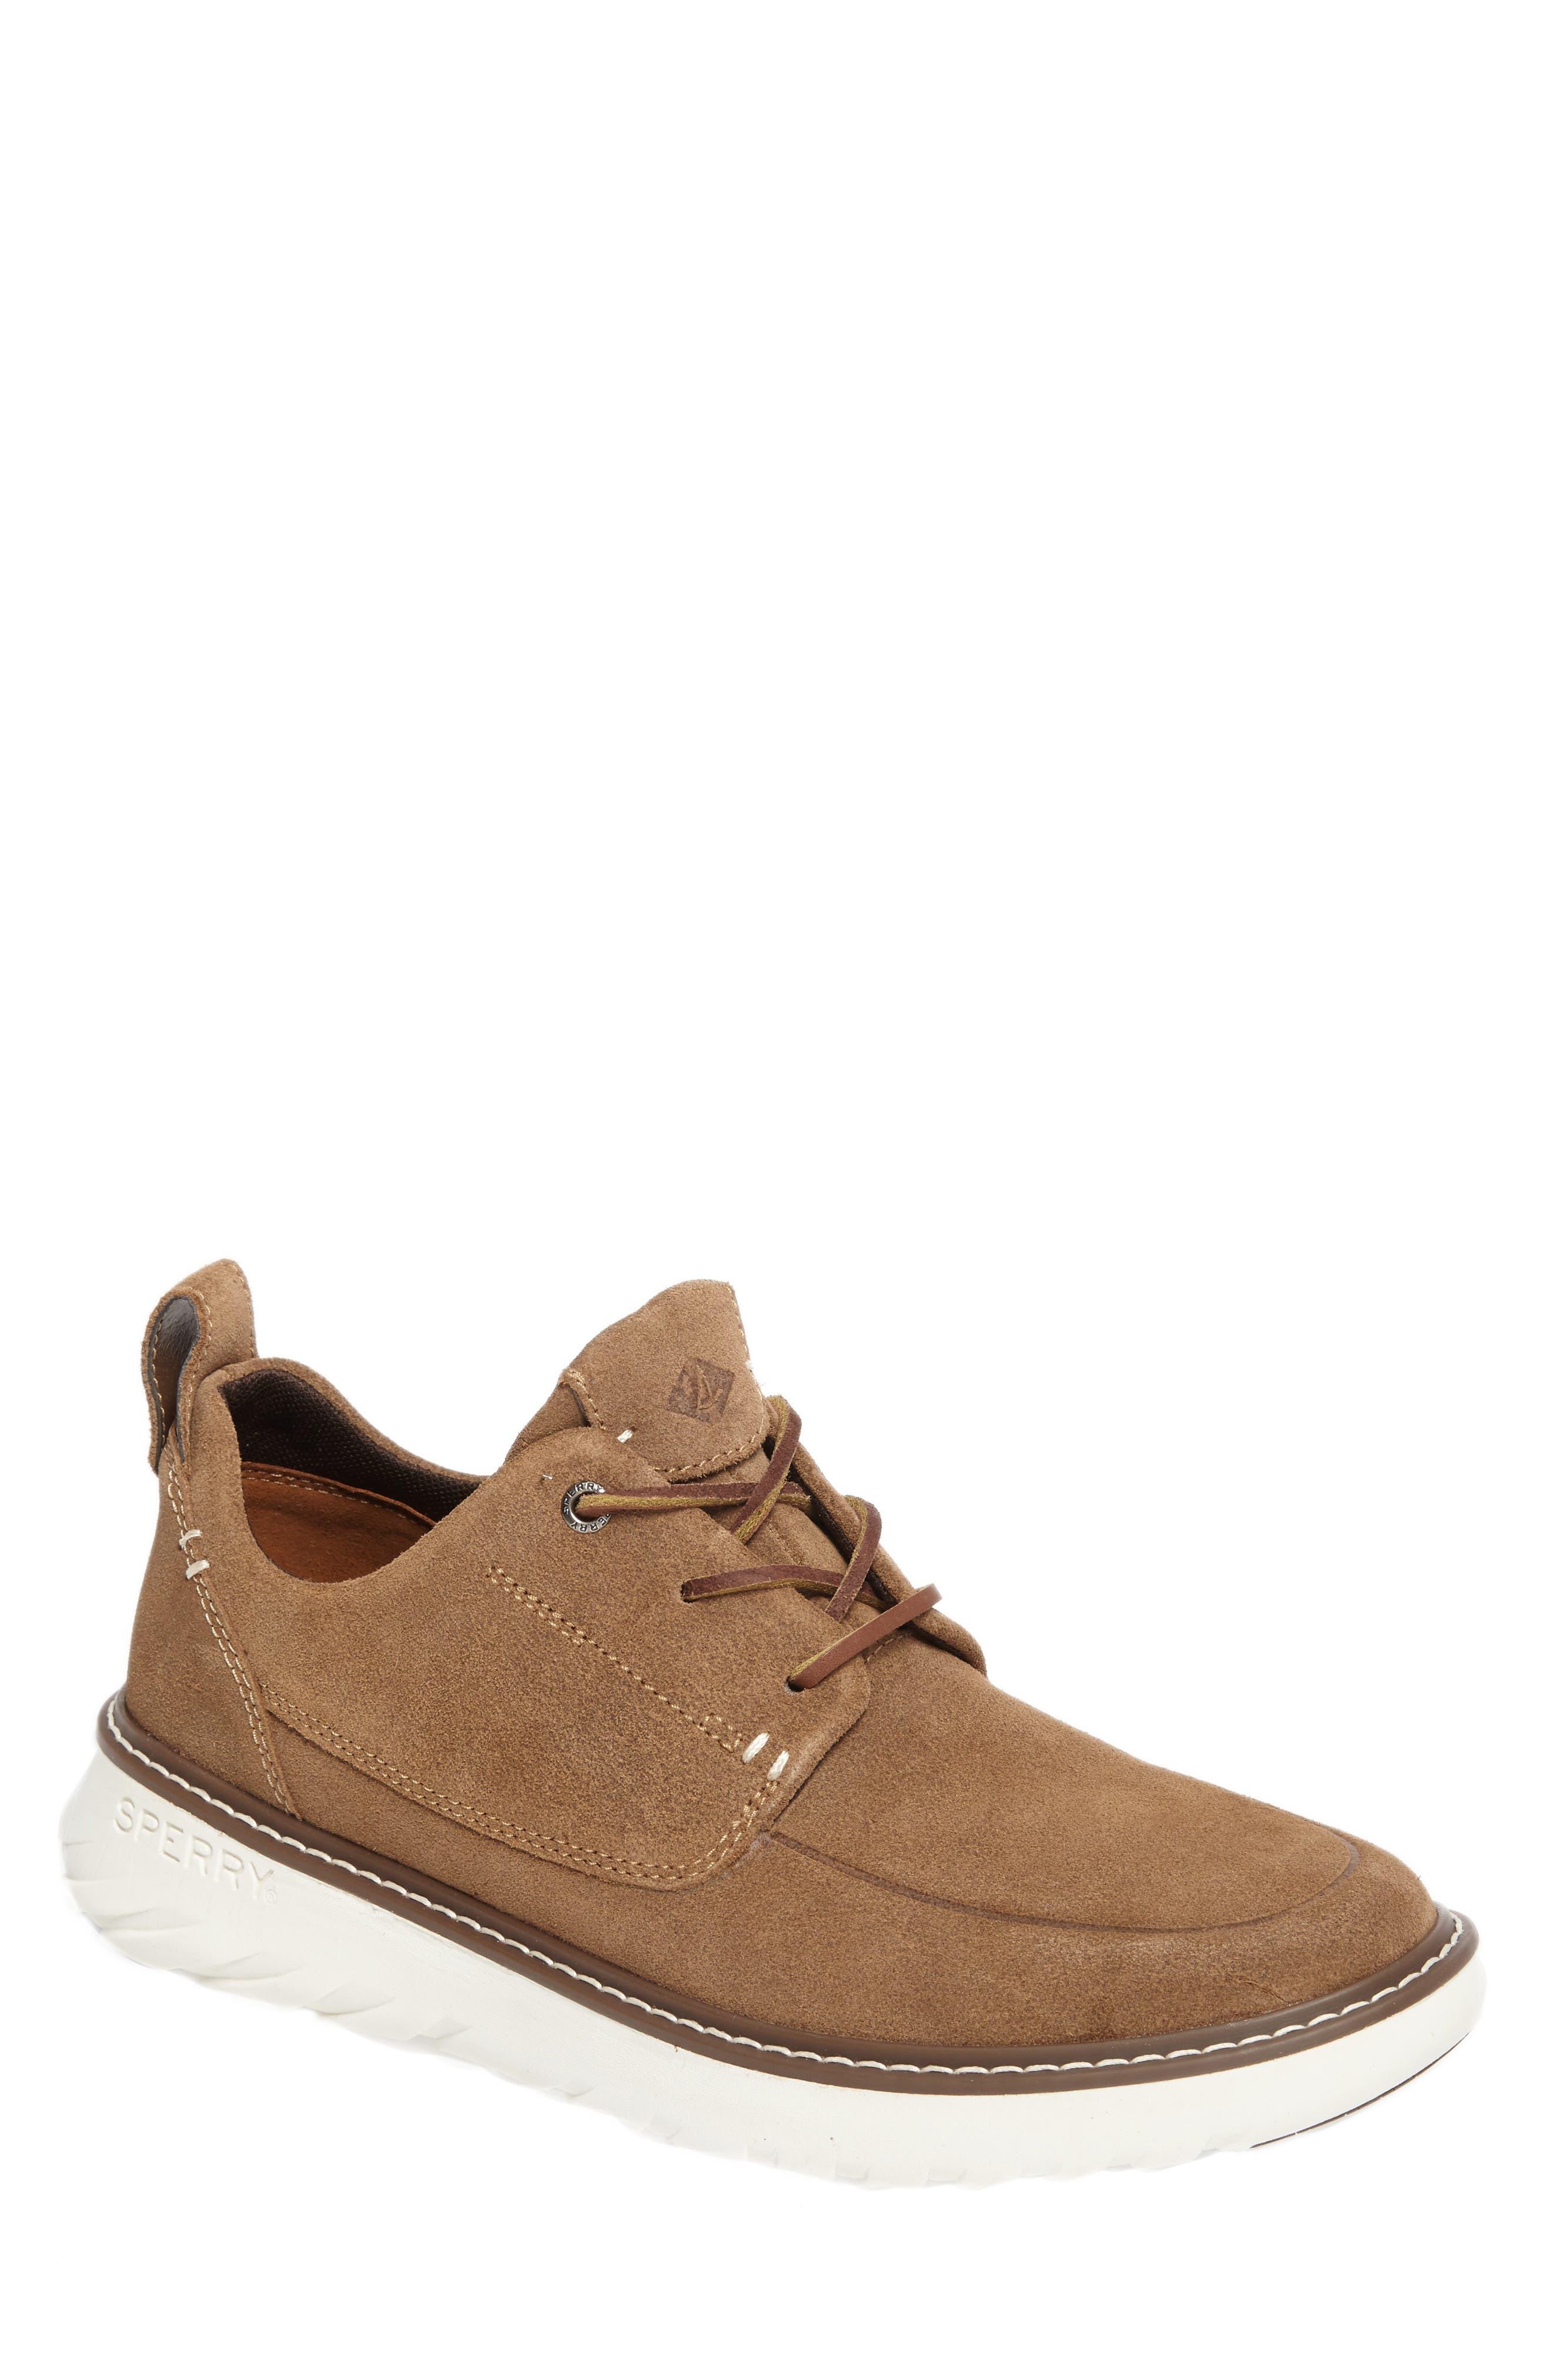 Element Chukka Boot,                         Main,                         color, Carmel Leather